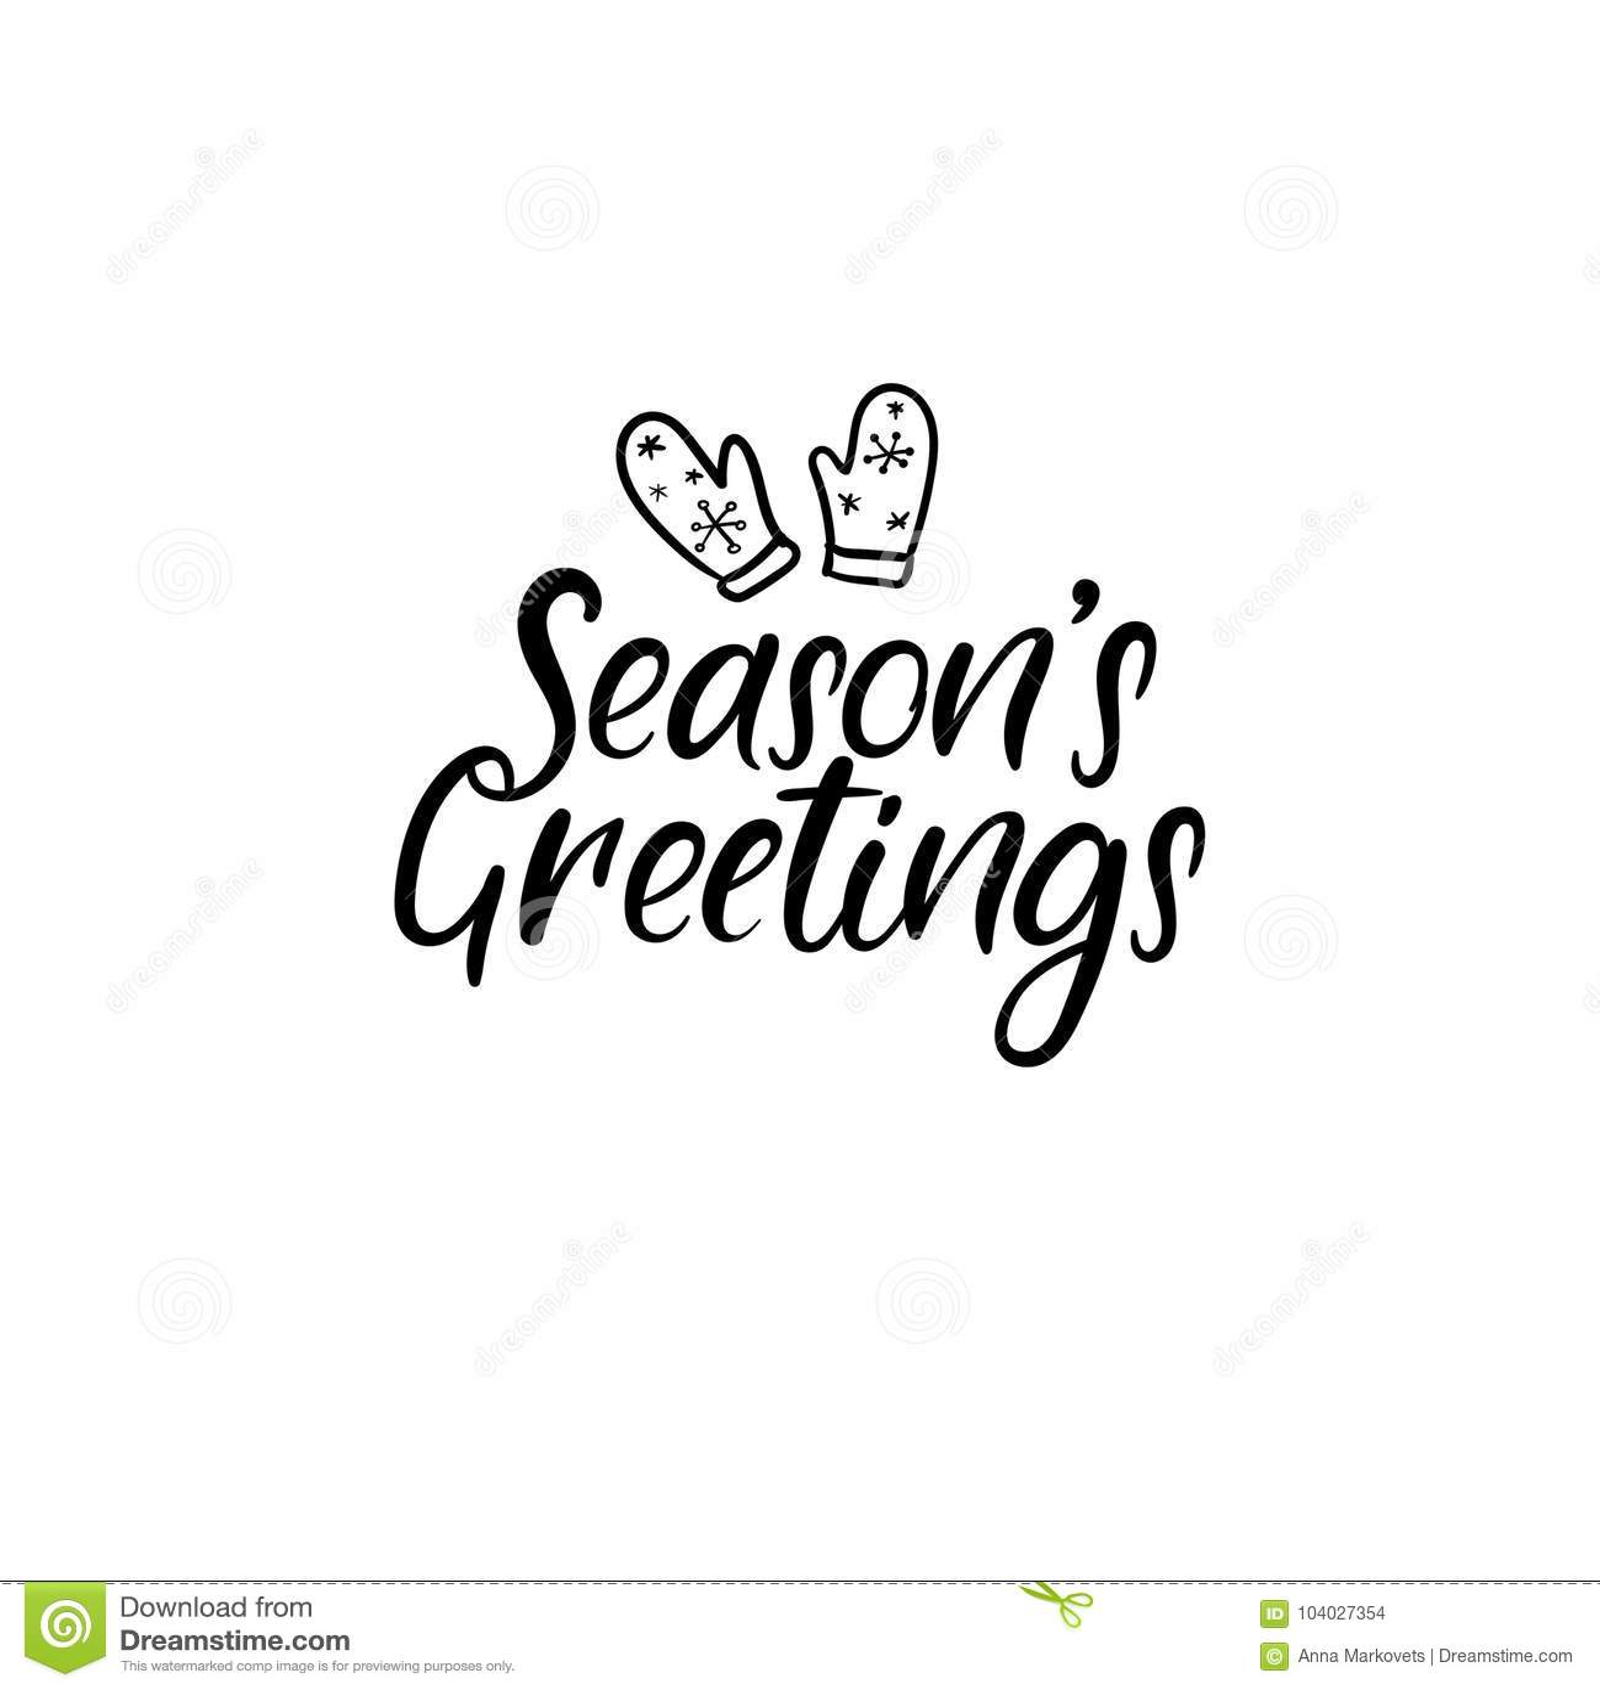 Seasons greetings hand lettering greeting card vector modern seasons greetings hand lettering greeting card vector modern calligraphy m4hsunfo